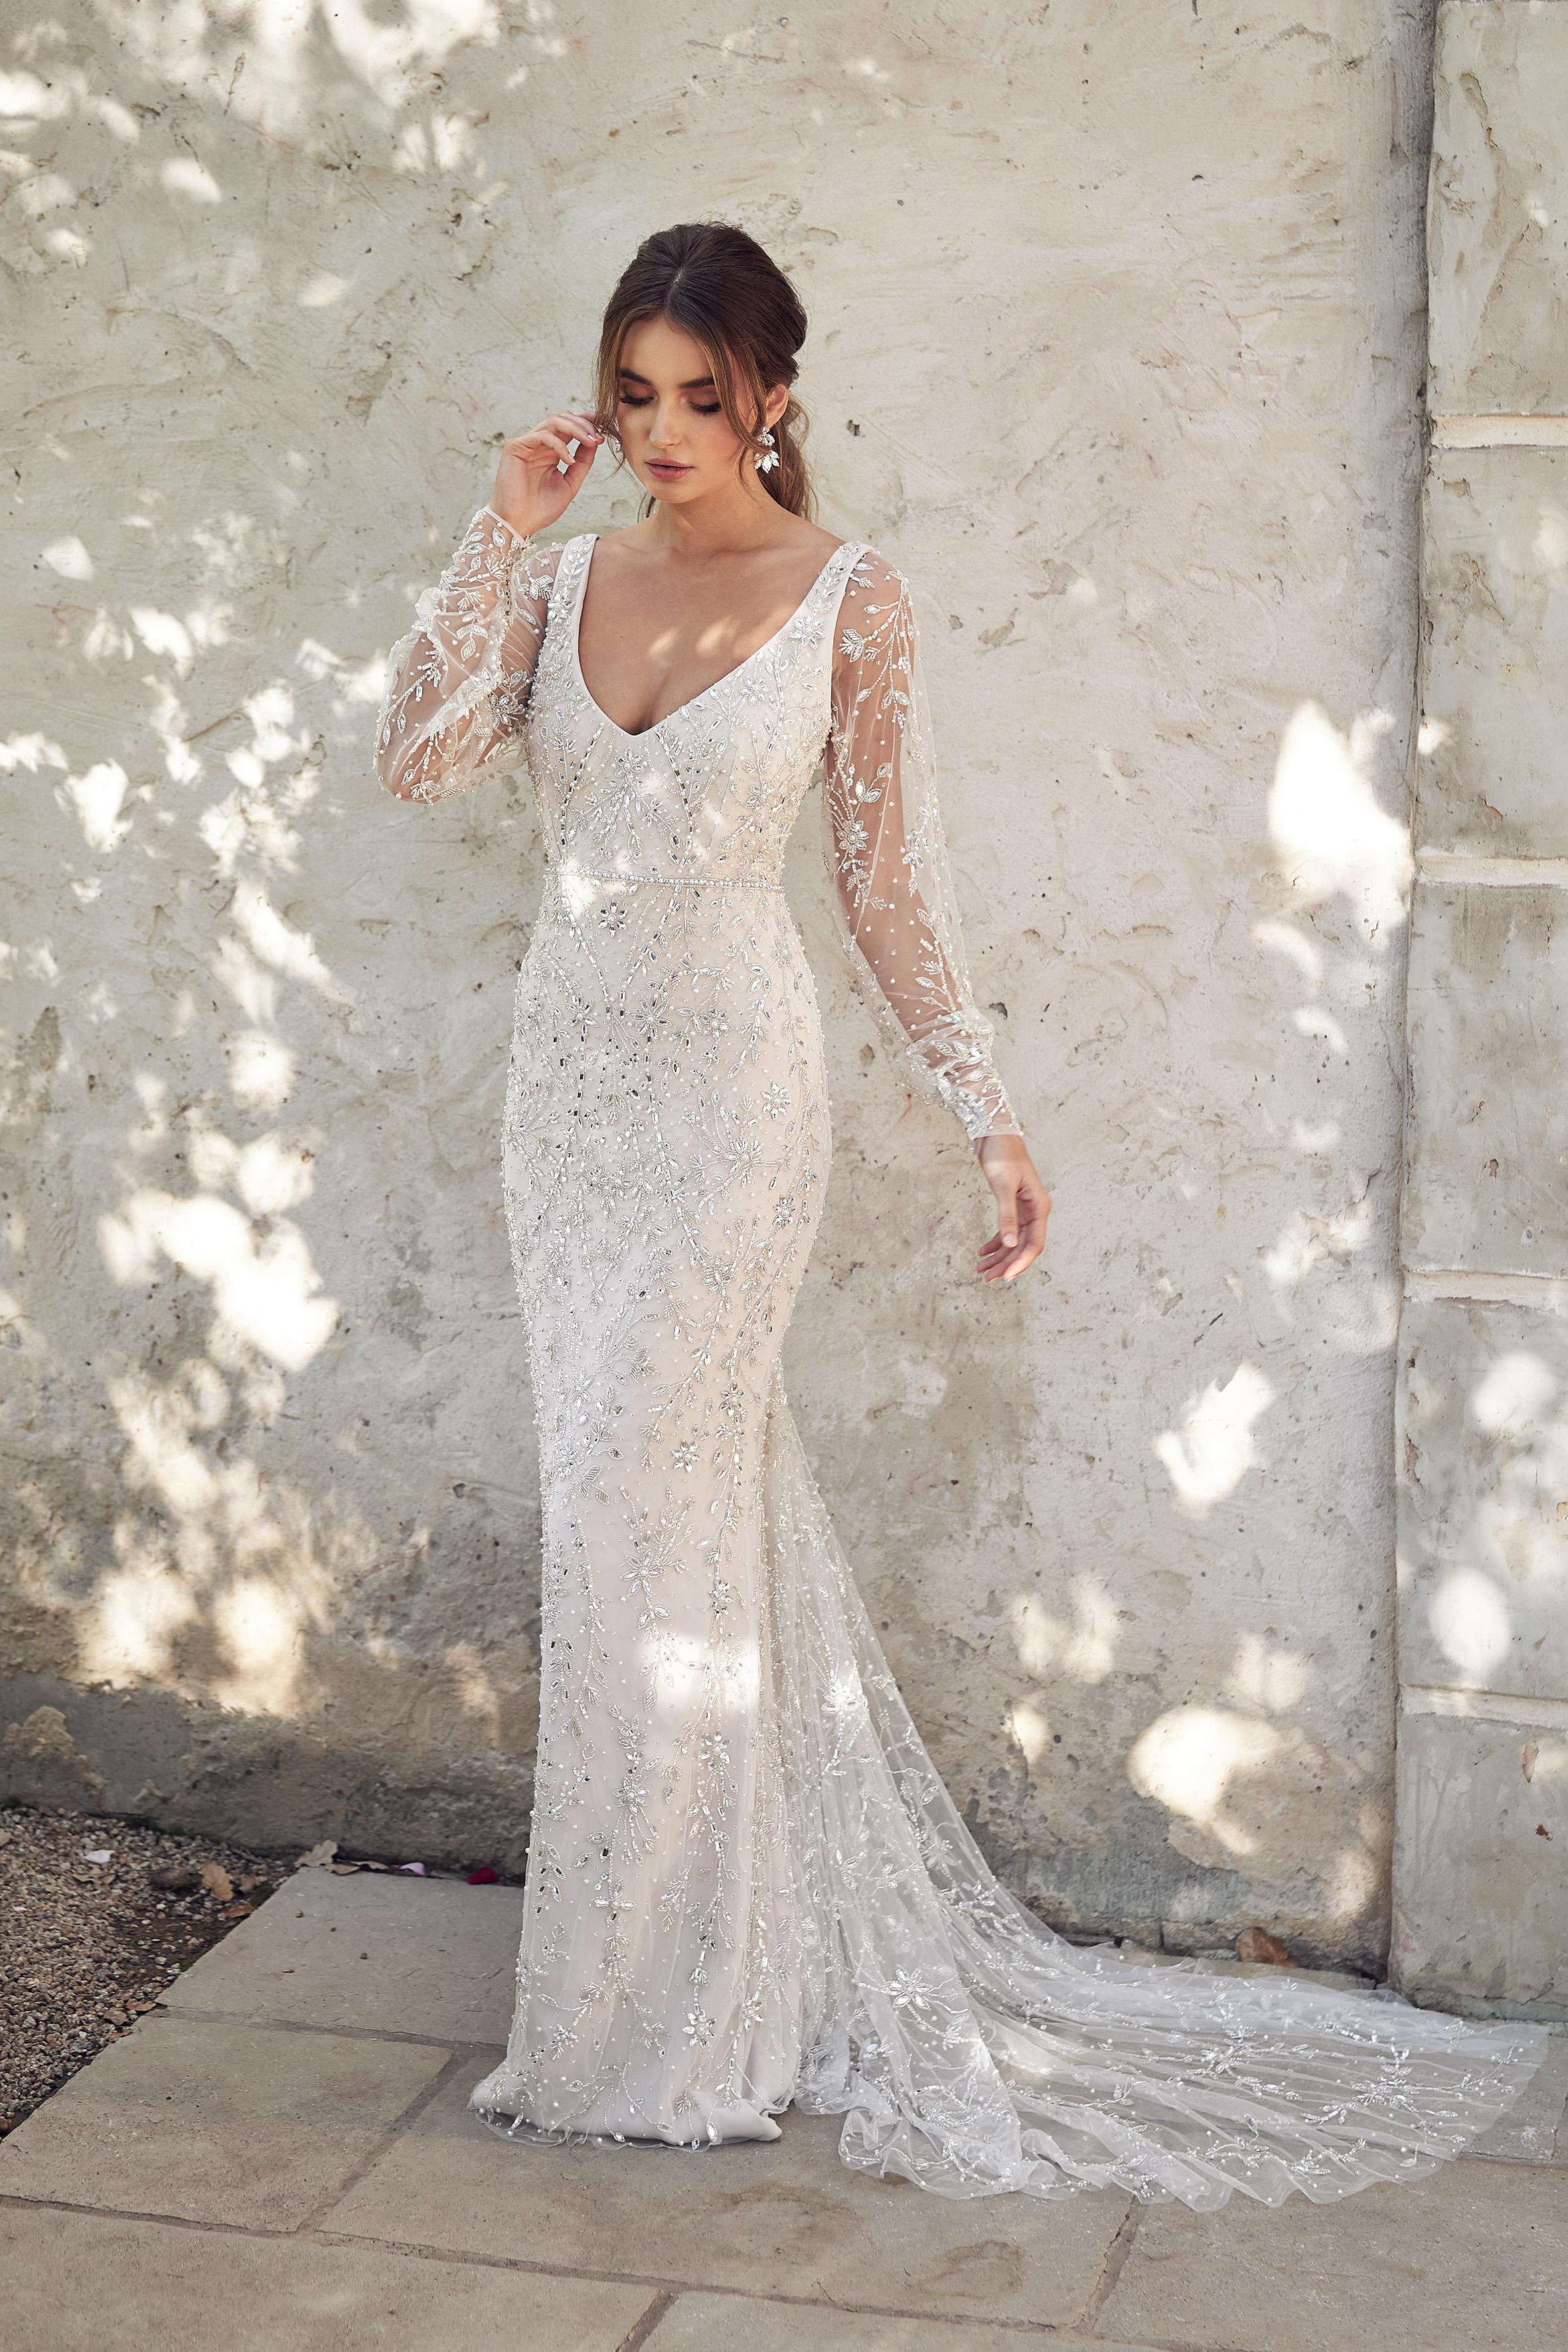 Anna Campbell Indigo Fitted Dress | Wedding Dress under $7,500 | LOVE FIND CO. Bridal Directory